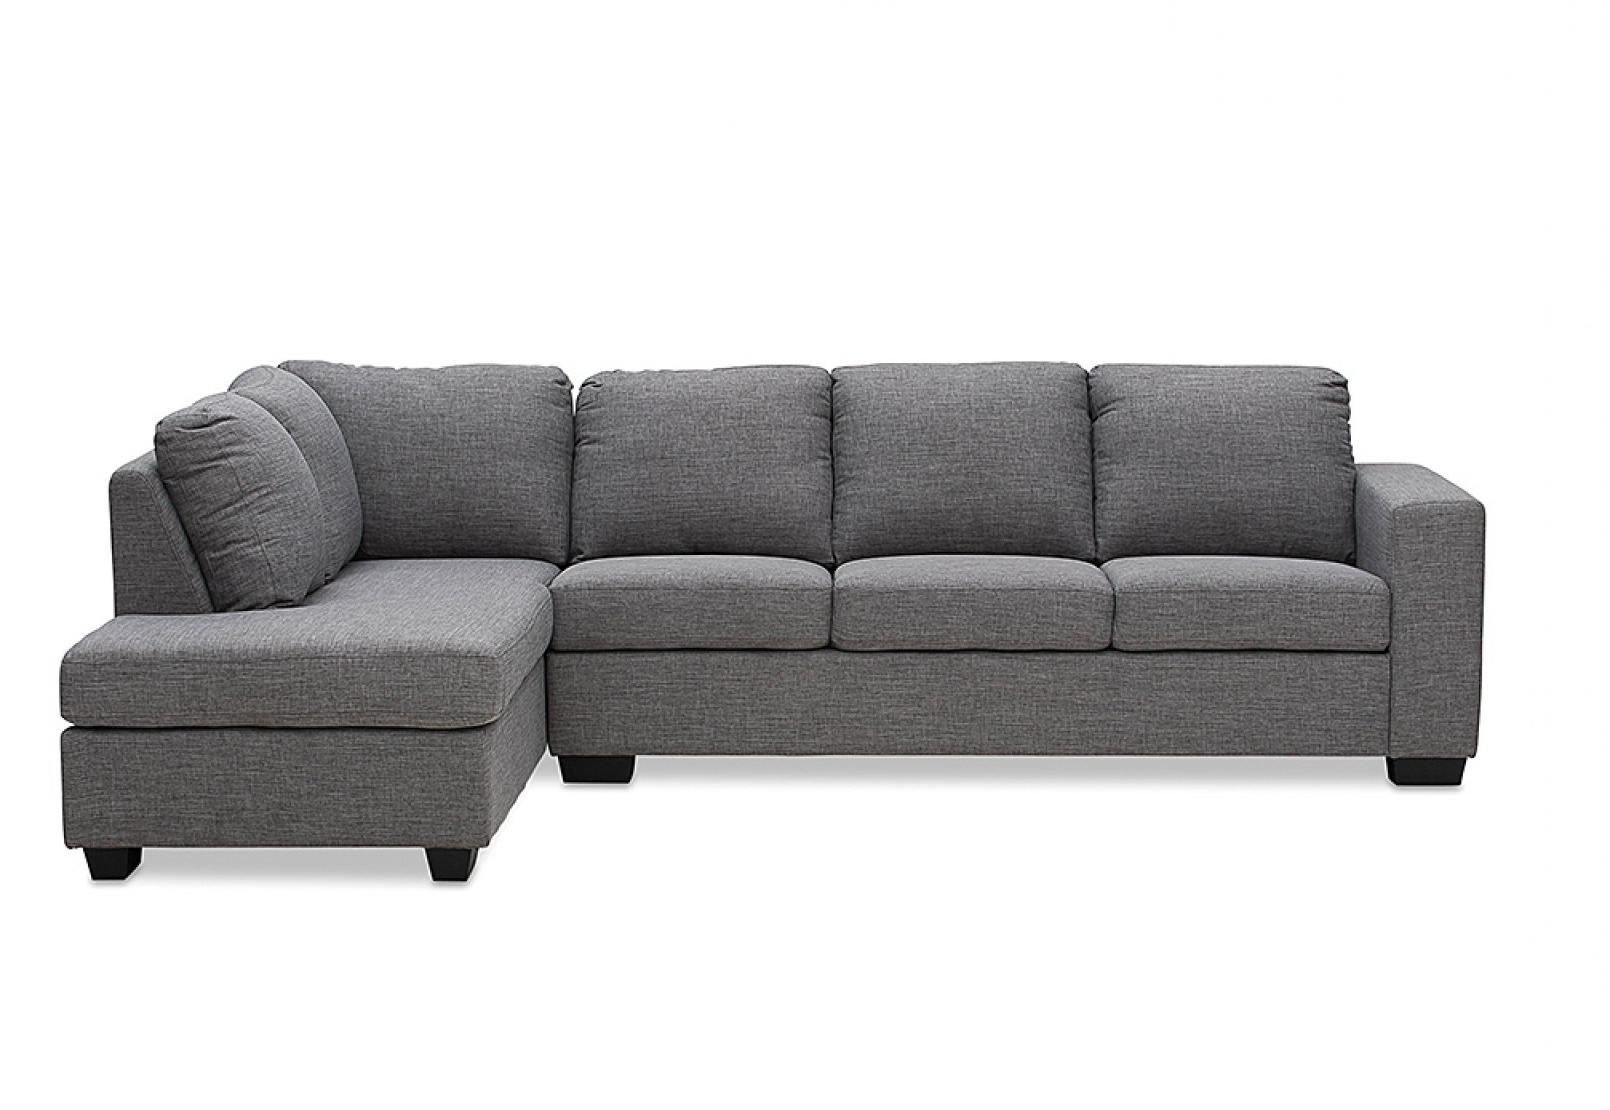 Bonza Fabric Corner Lounge Suite (View 7 of 15)